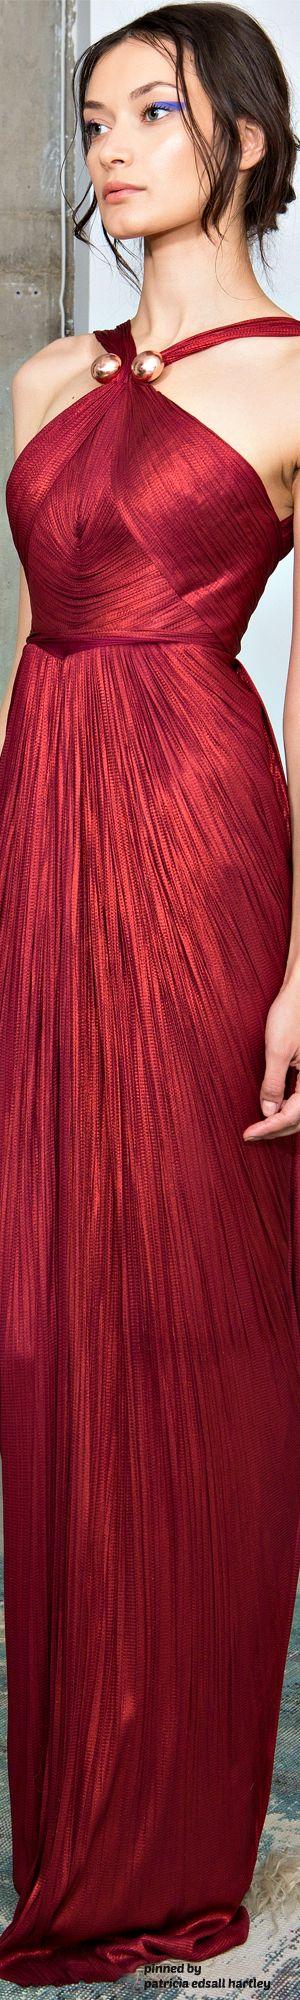 Wrinkled draped red dress